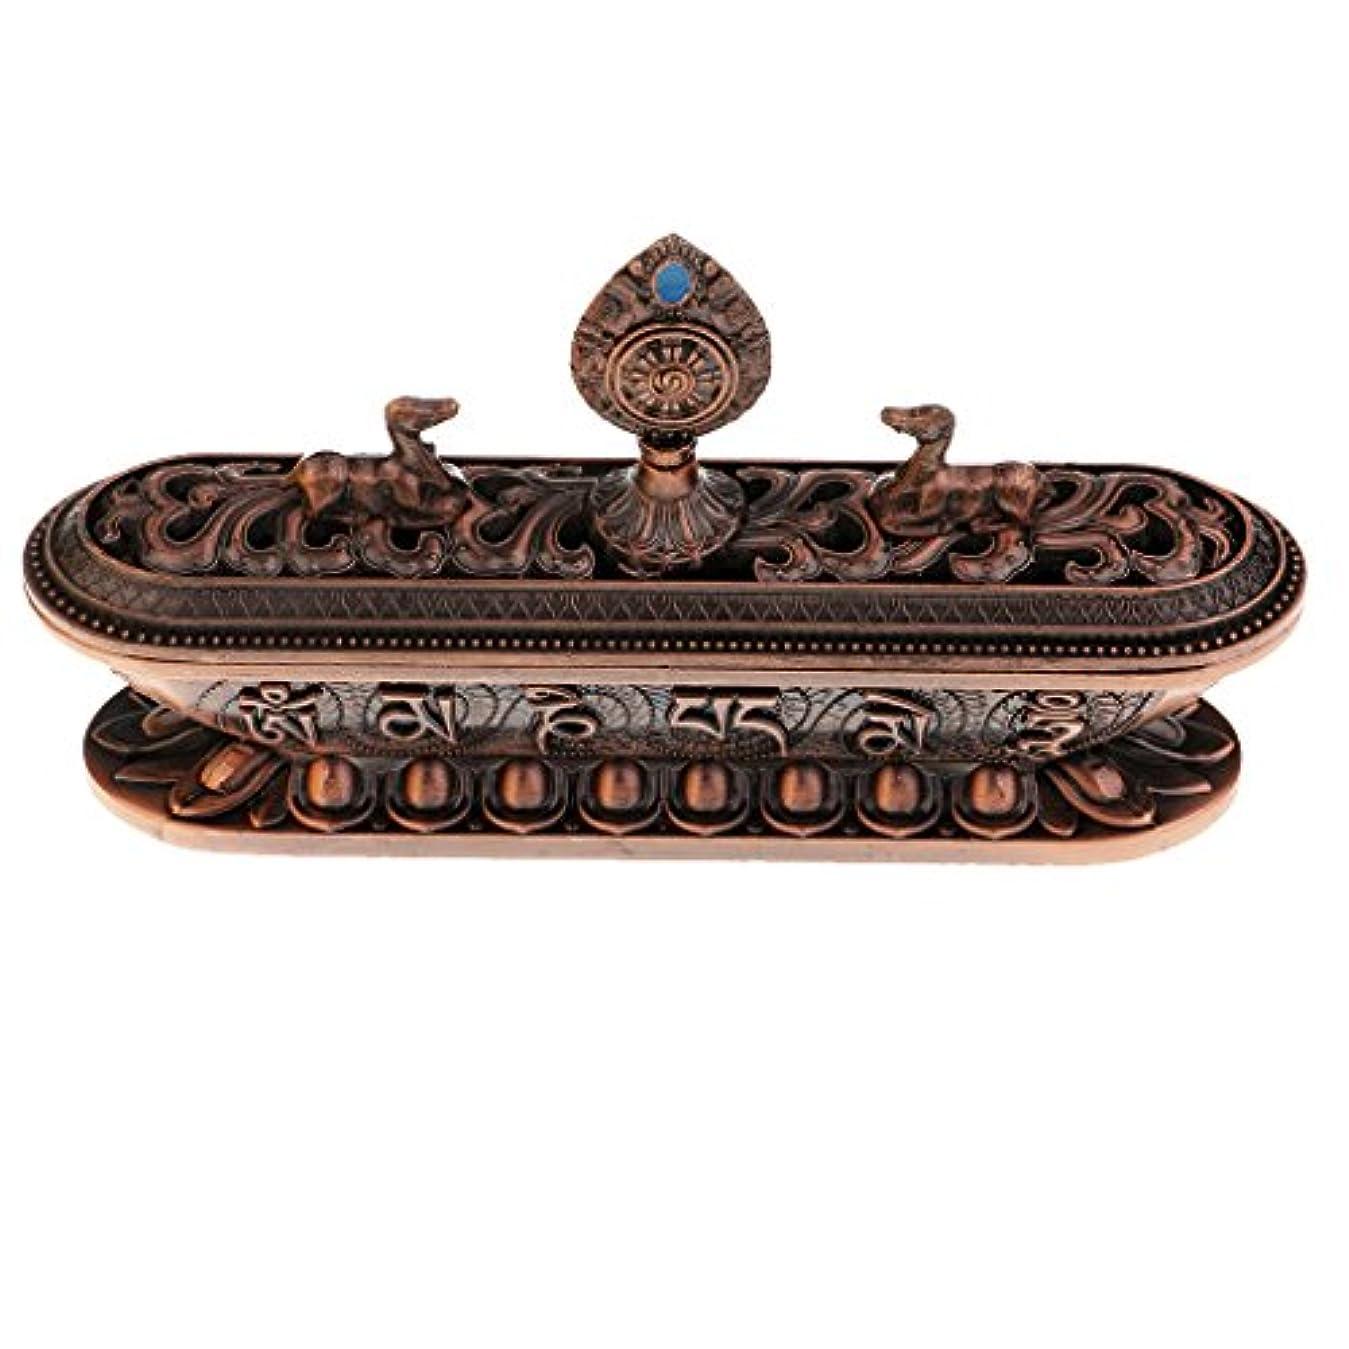 Fenteer 仏教香炉バーナー 合金 テーブル ホーム インテリア 仏教用品 ホルダー 香炉 バーナー 合金 6タイプ選べる - #3